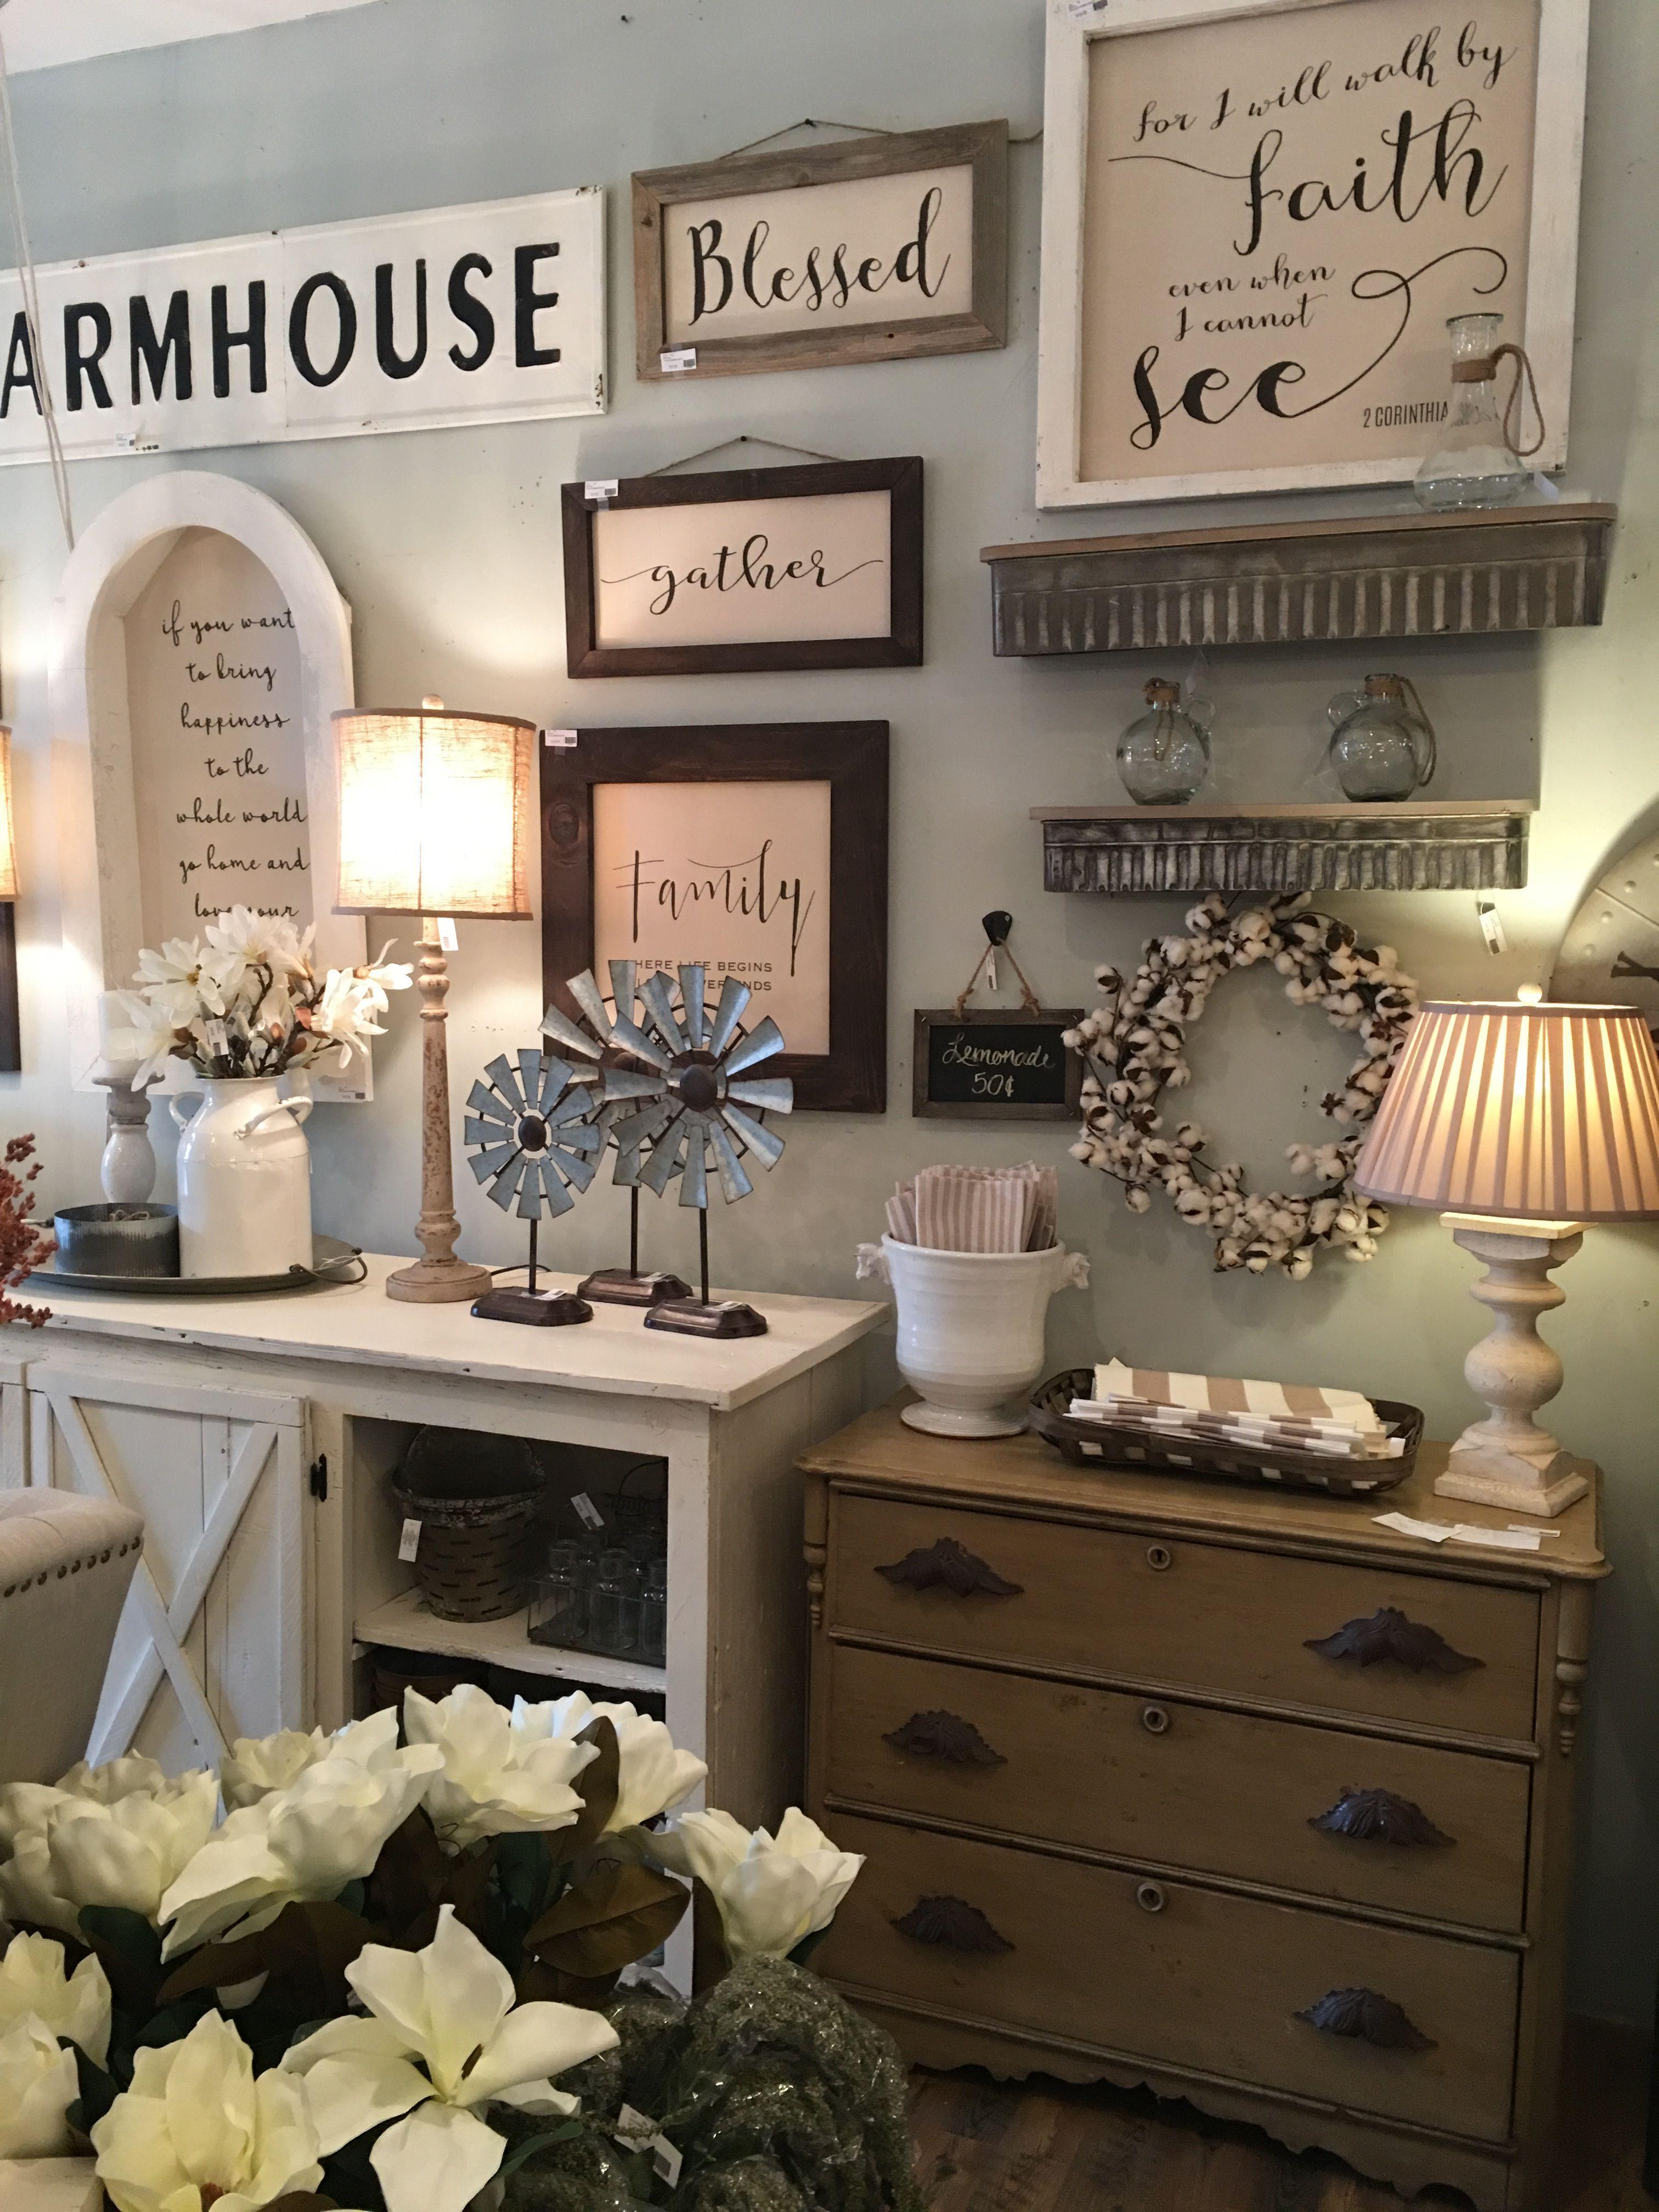 31 Cozy And Chic Farmhouse Kitchen Décor Ideas | DigsDigs  |Farmhouse Decor Shabby Organization